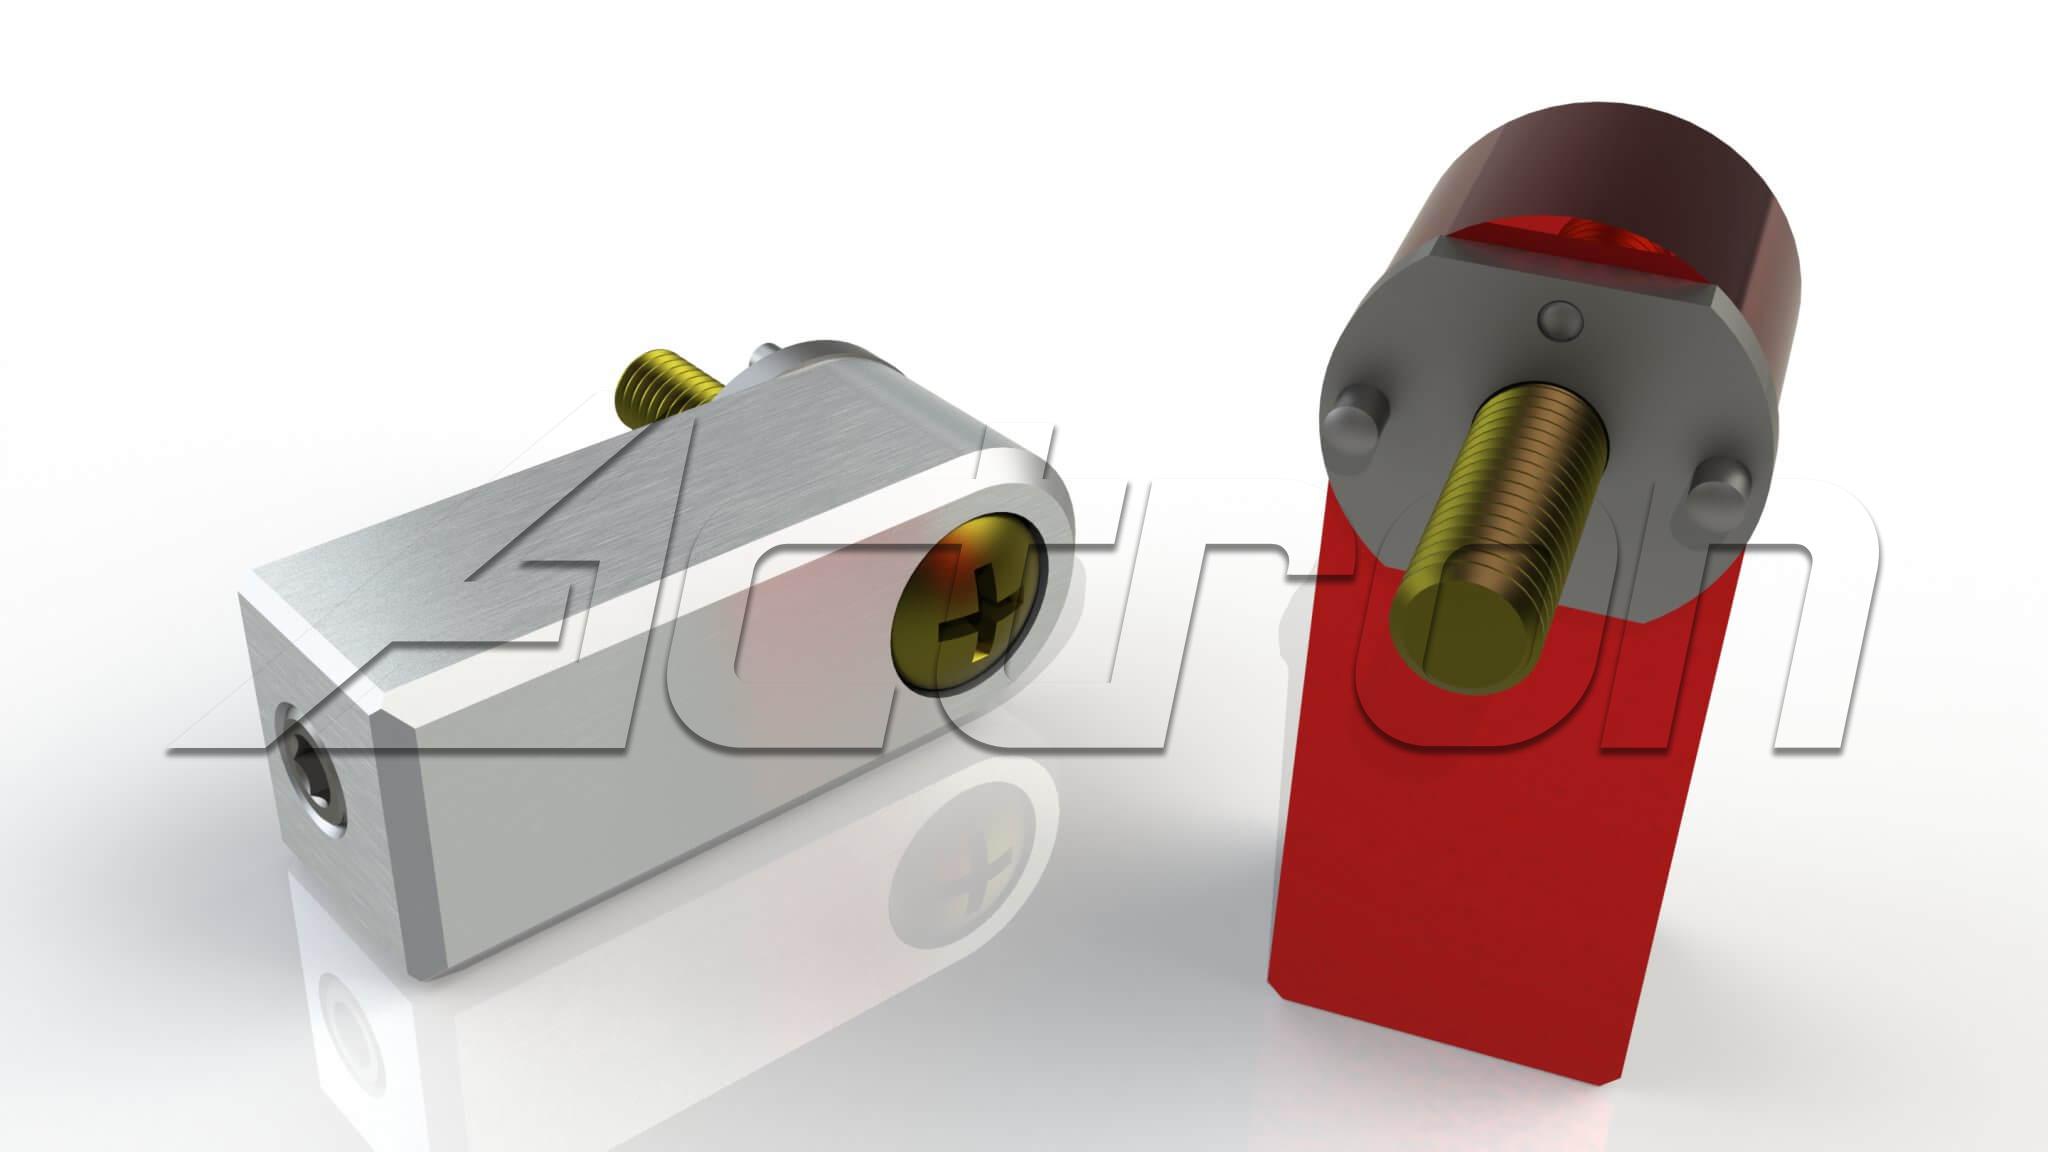 1-4-turn-retainer-4744-a35514.jpg